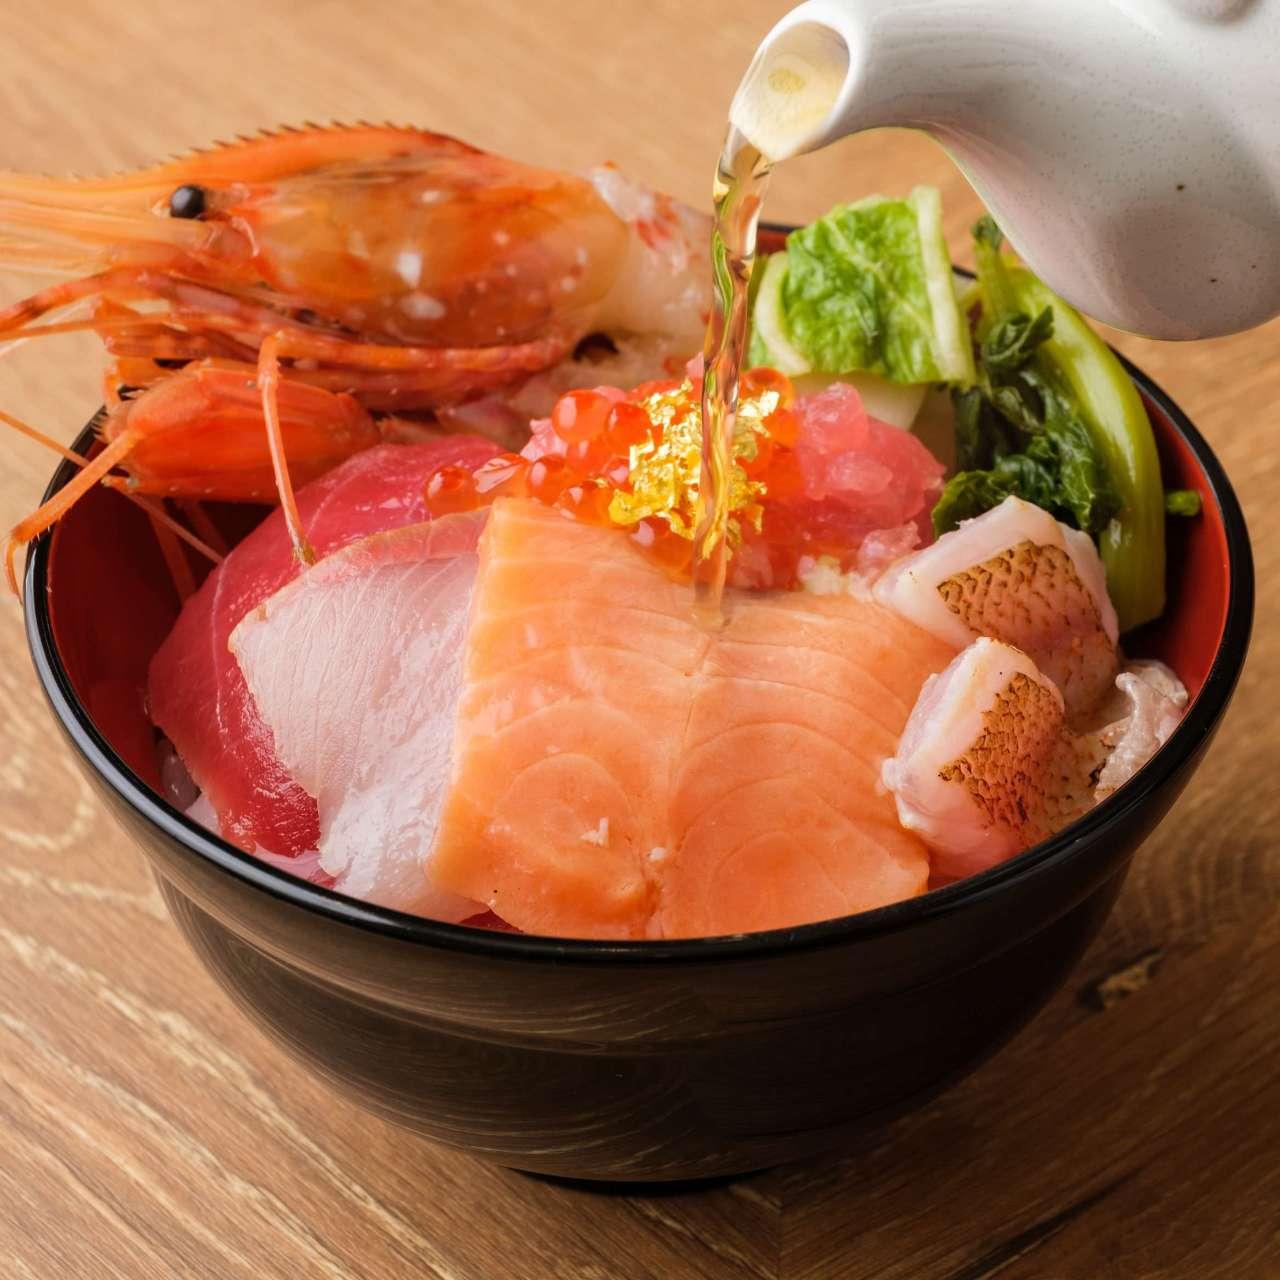 絶品!北陸の新鮮素材の海鮮茶漬丼